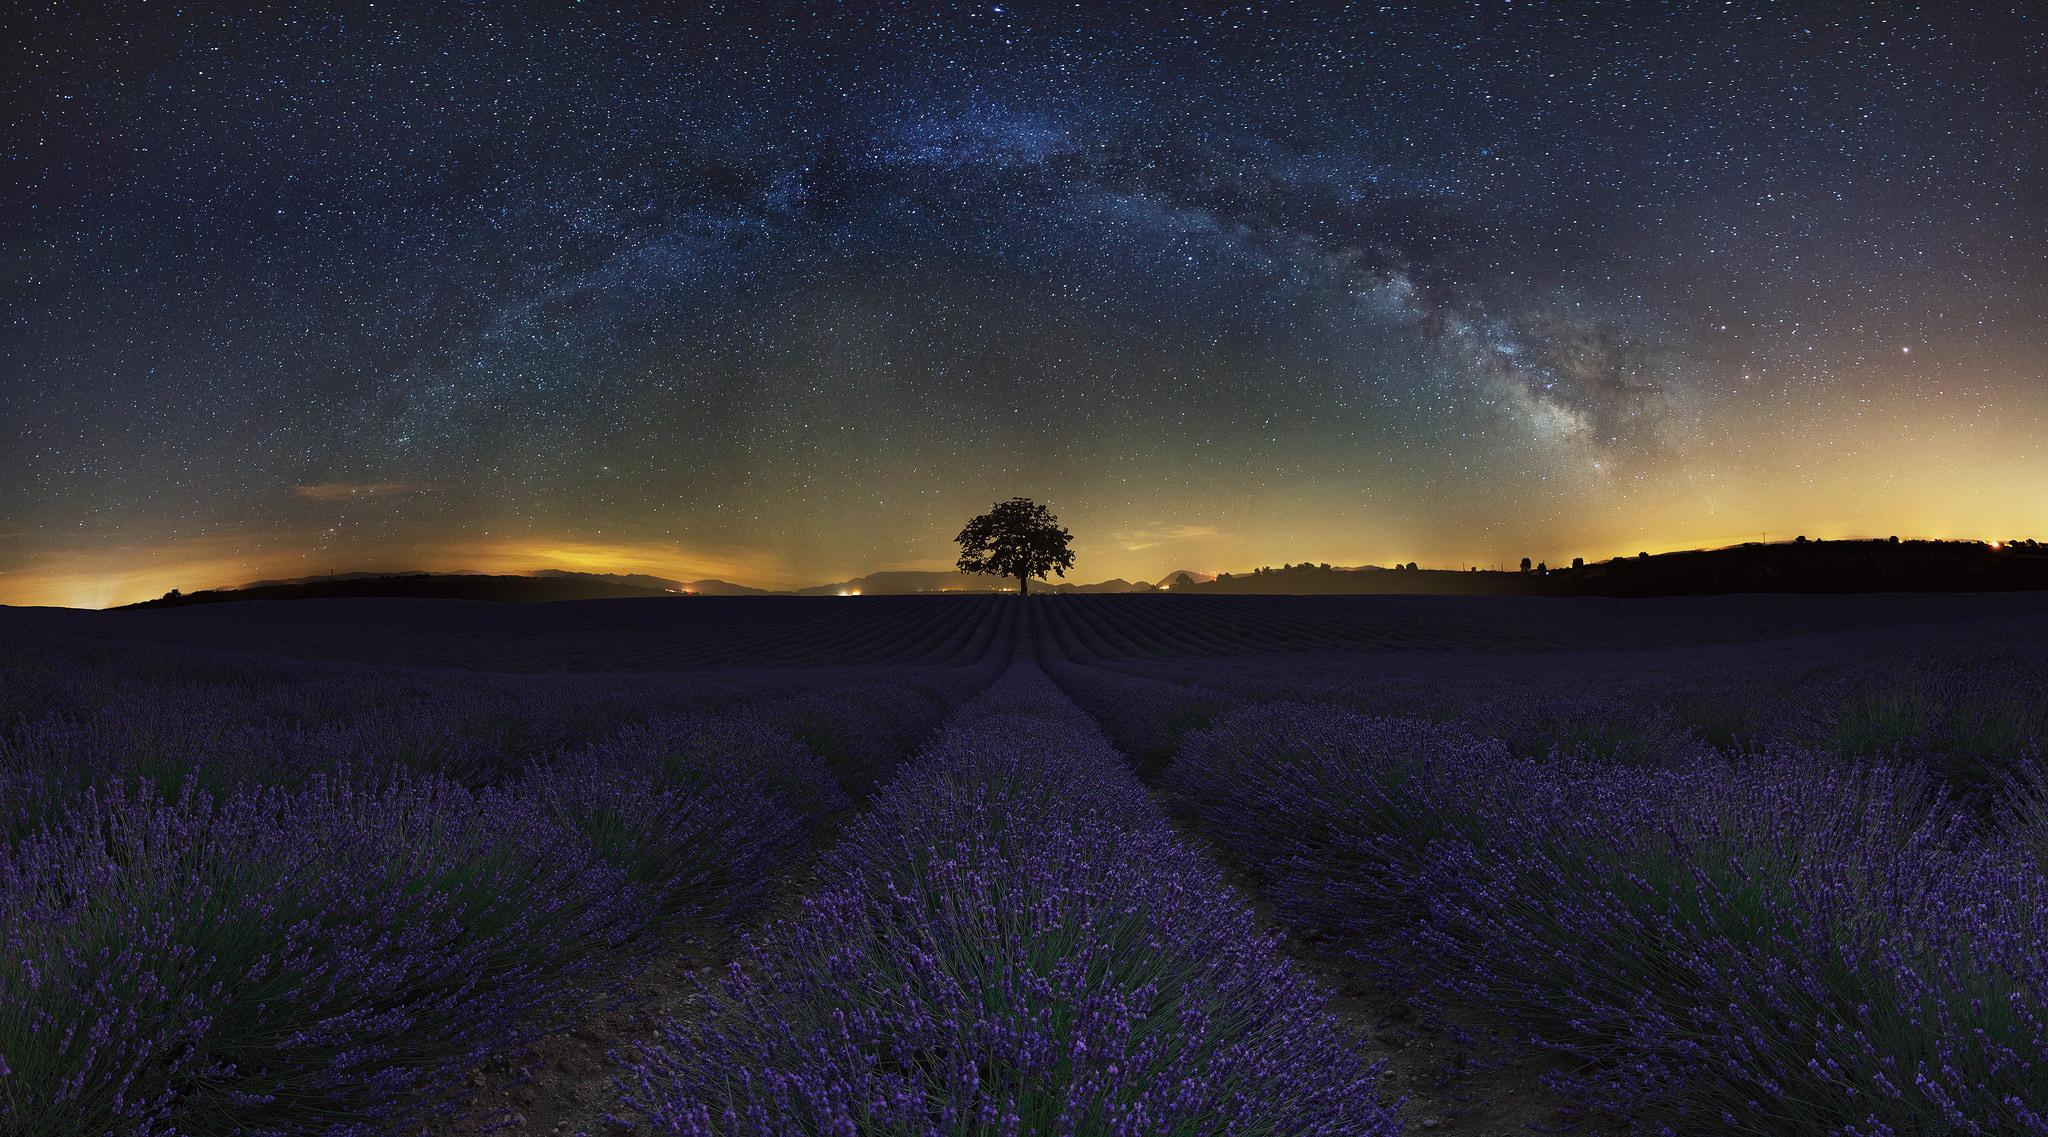 Lavender-field-under-stars.jpg